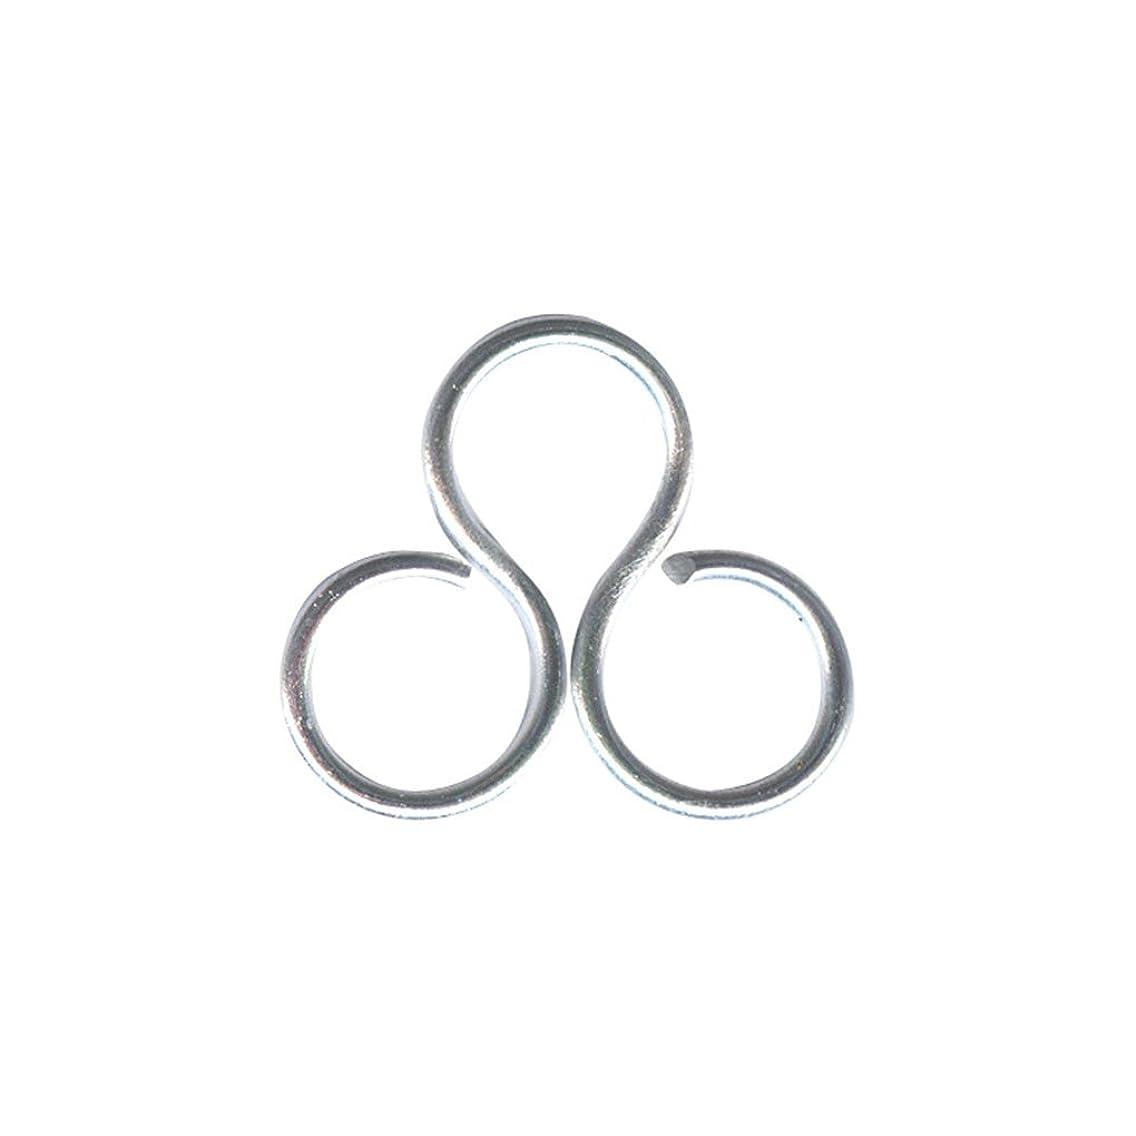 Vaessen Creative Aluminium wire 4mm 10m silver,